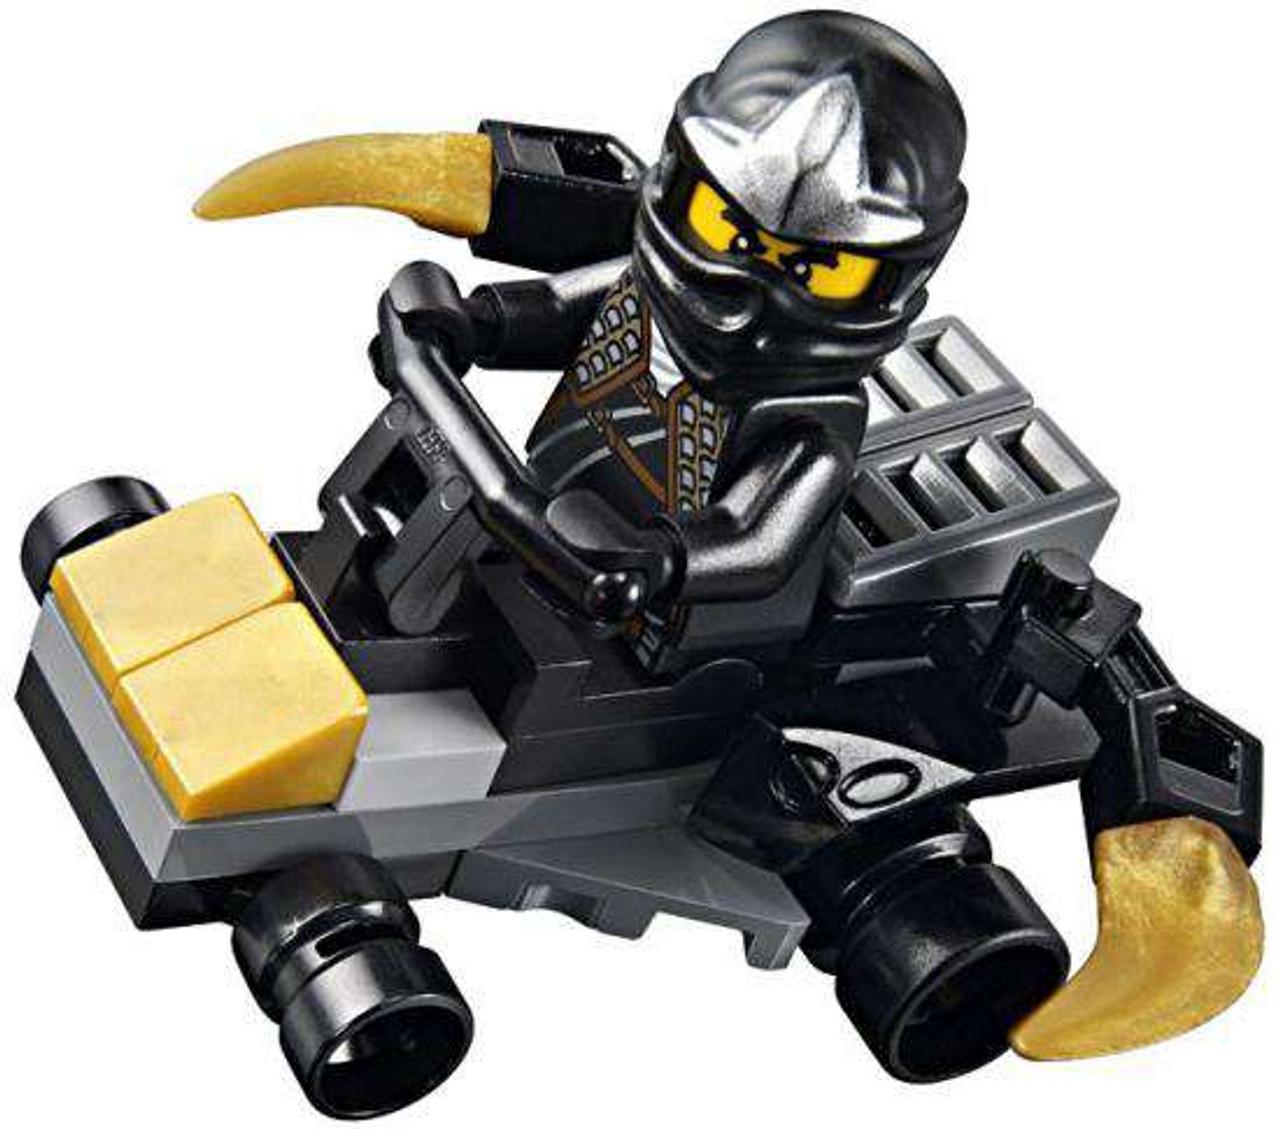 LEGO Ninjago Cole ZXs Car Mini Set 30087 Bagged - ToyWiz